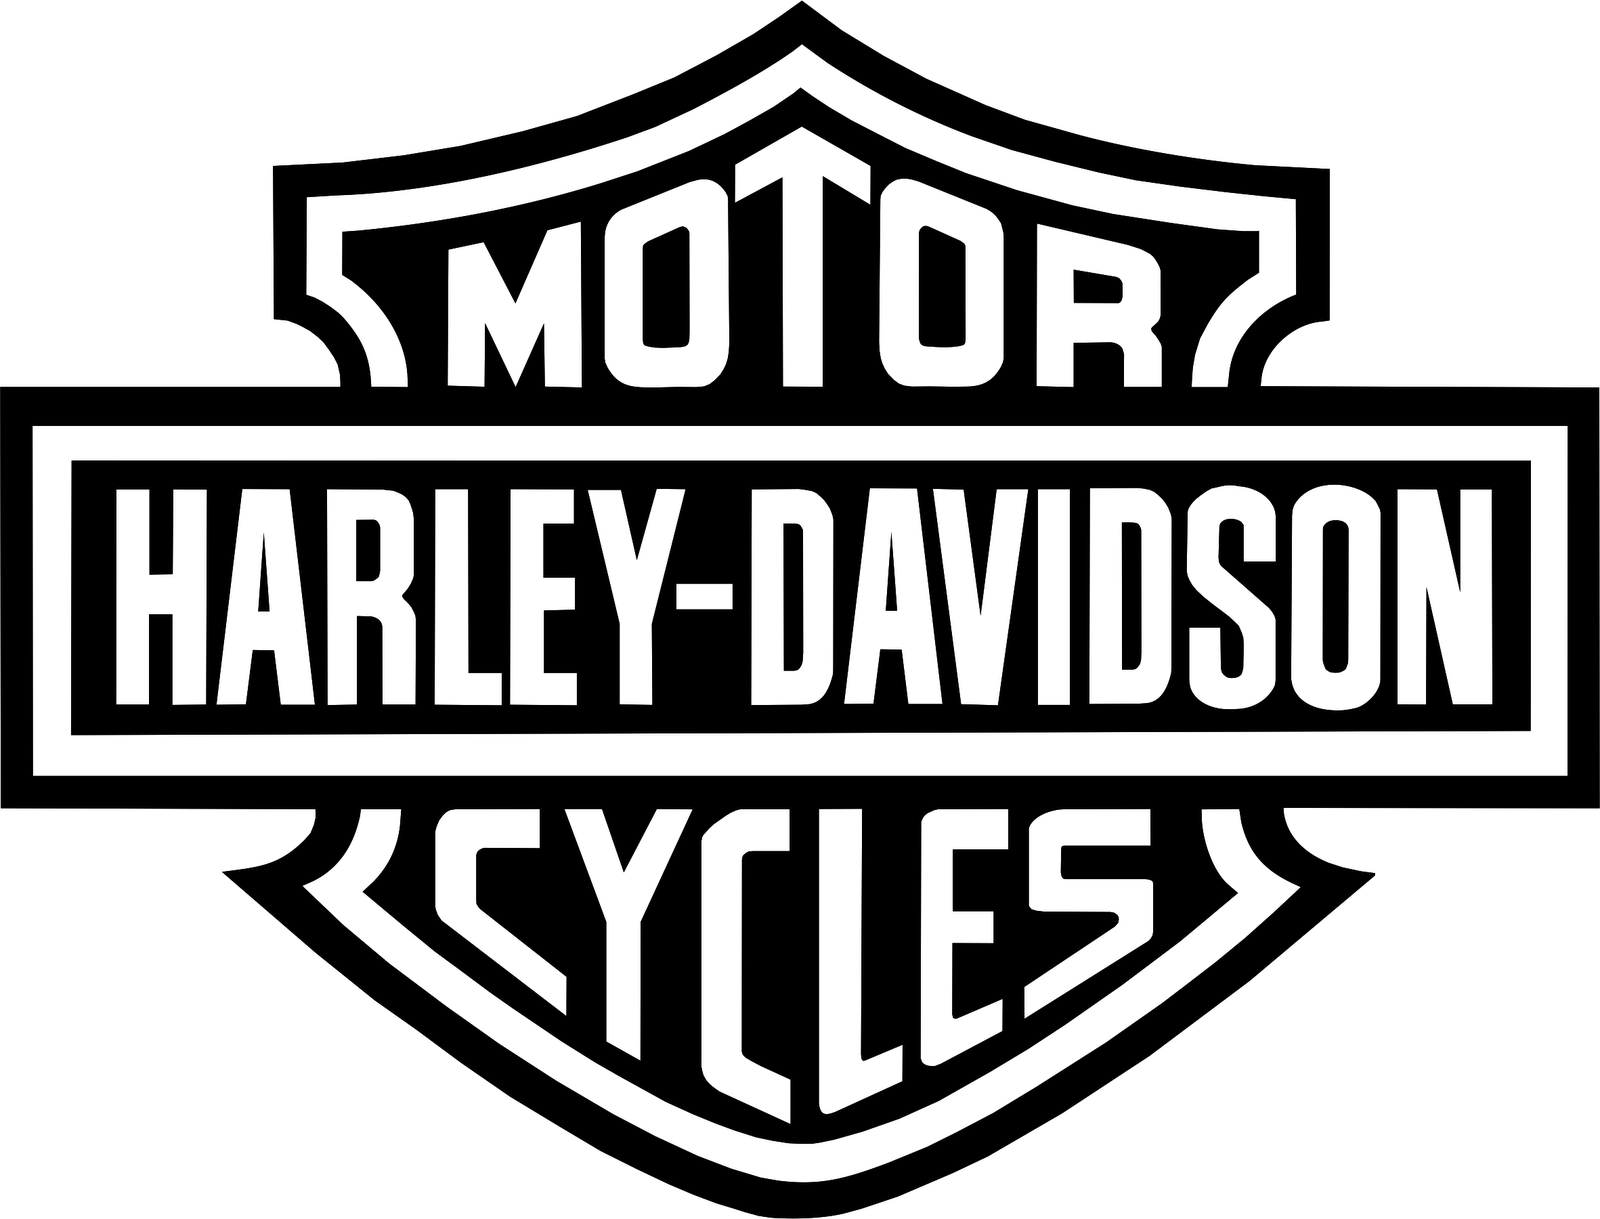 Harley davidson logo free. Motorcycle clipart bitmap